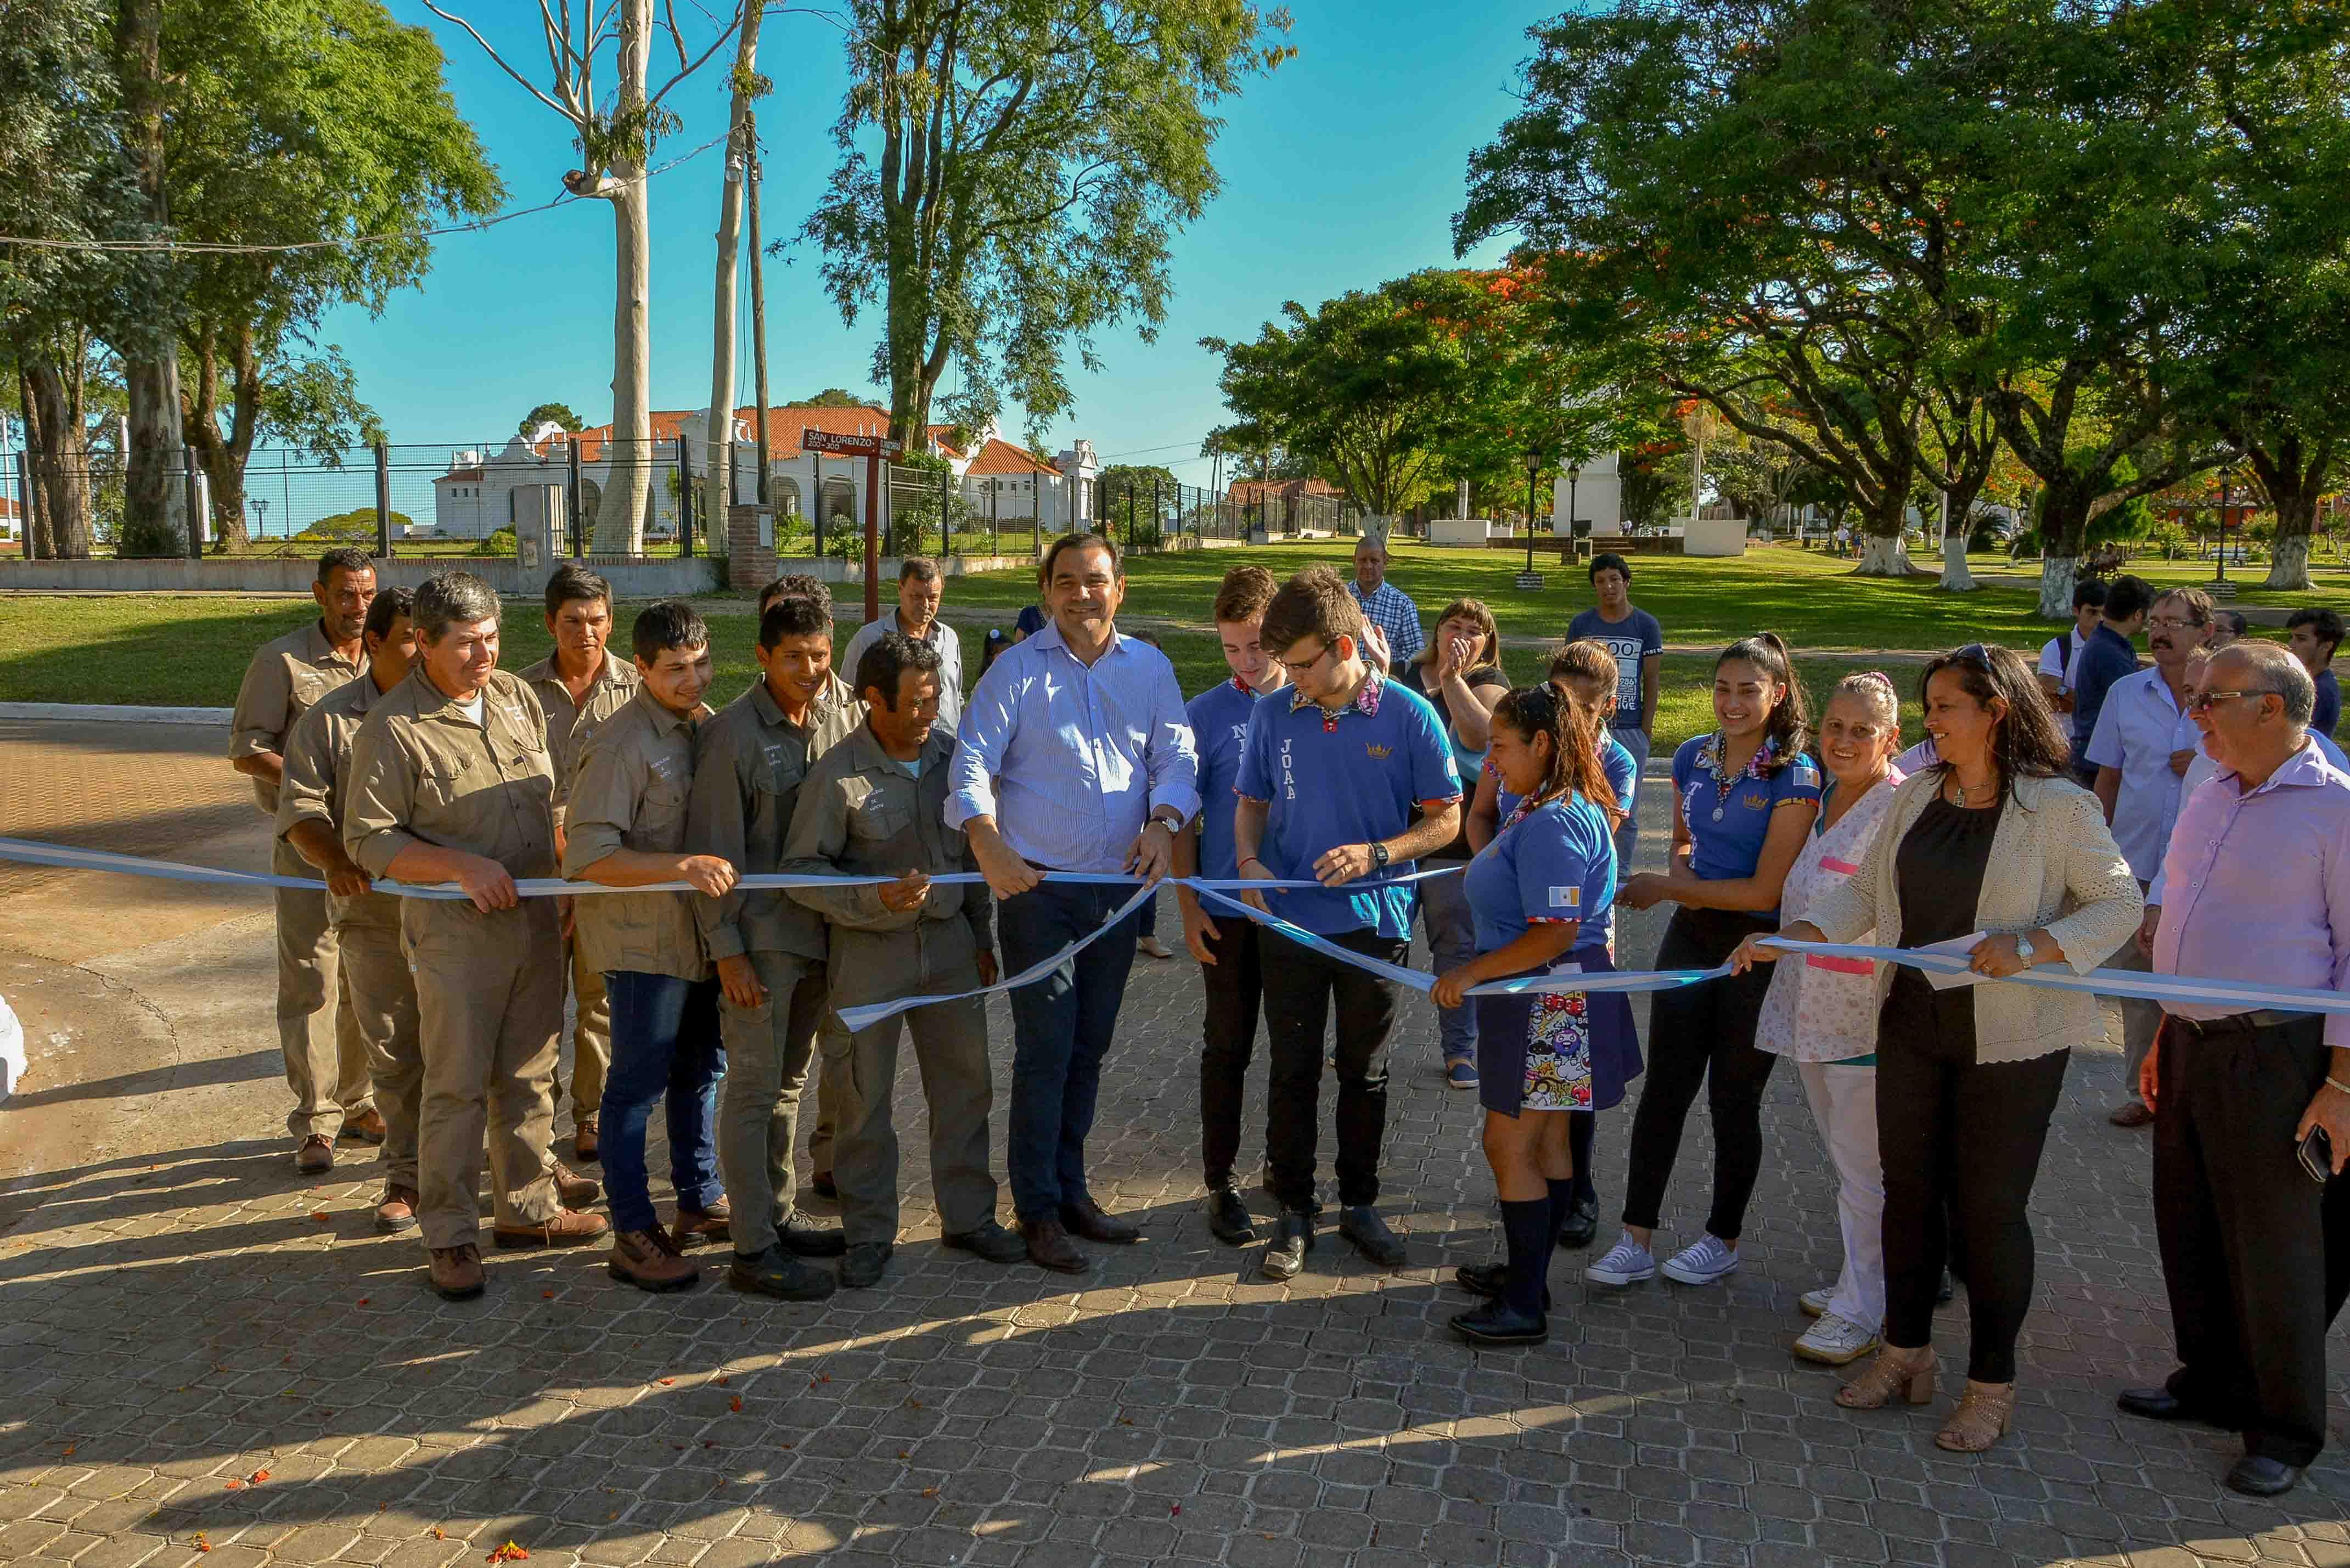 El Gobernador inauguró obras y anunció múltiples infraestructuras «para honrar al Padre de la Patria»